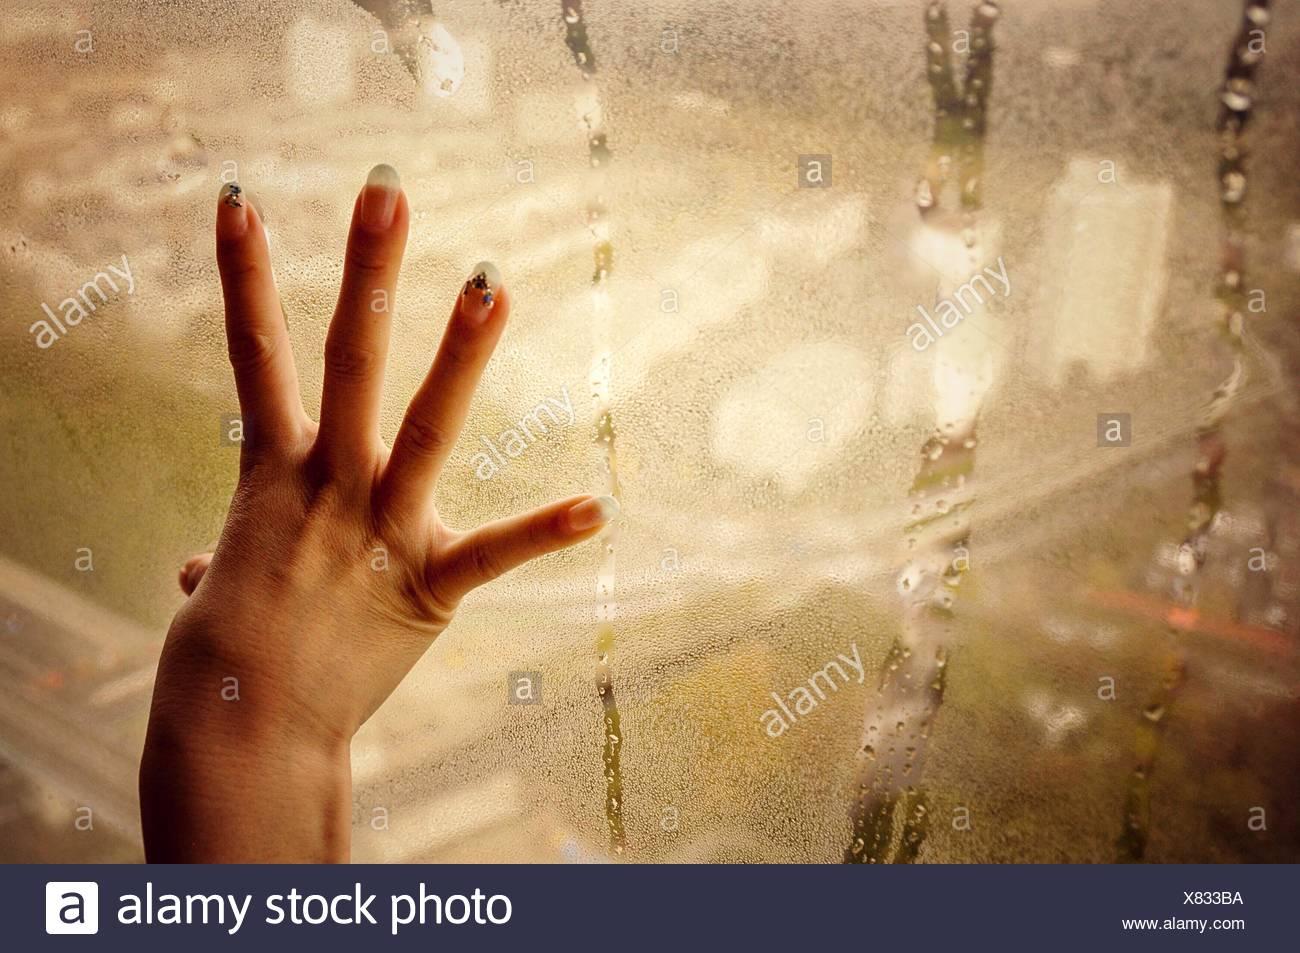 Abgeschnittenen Hand auf verkürzten Glas Stockbild